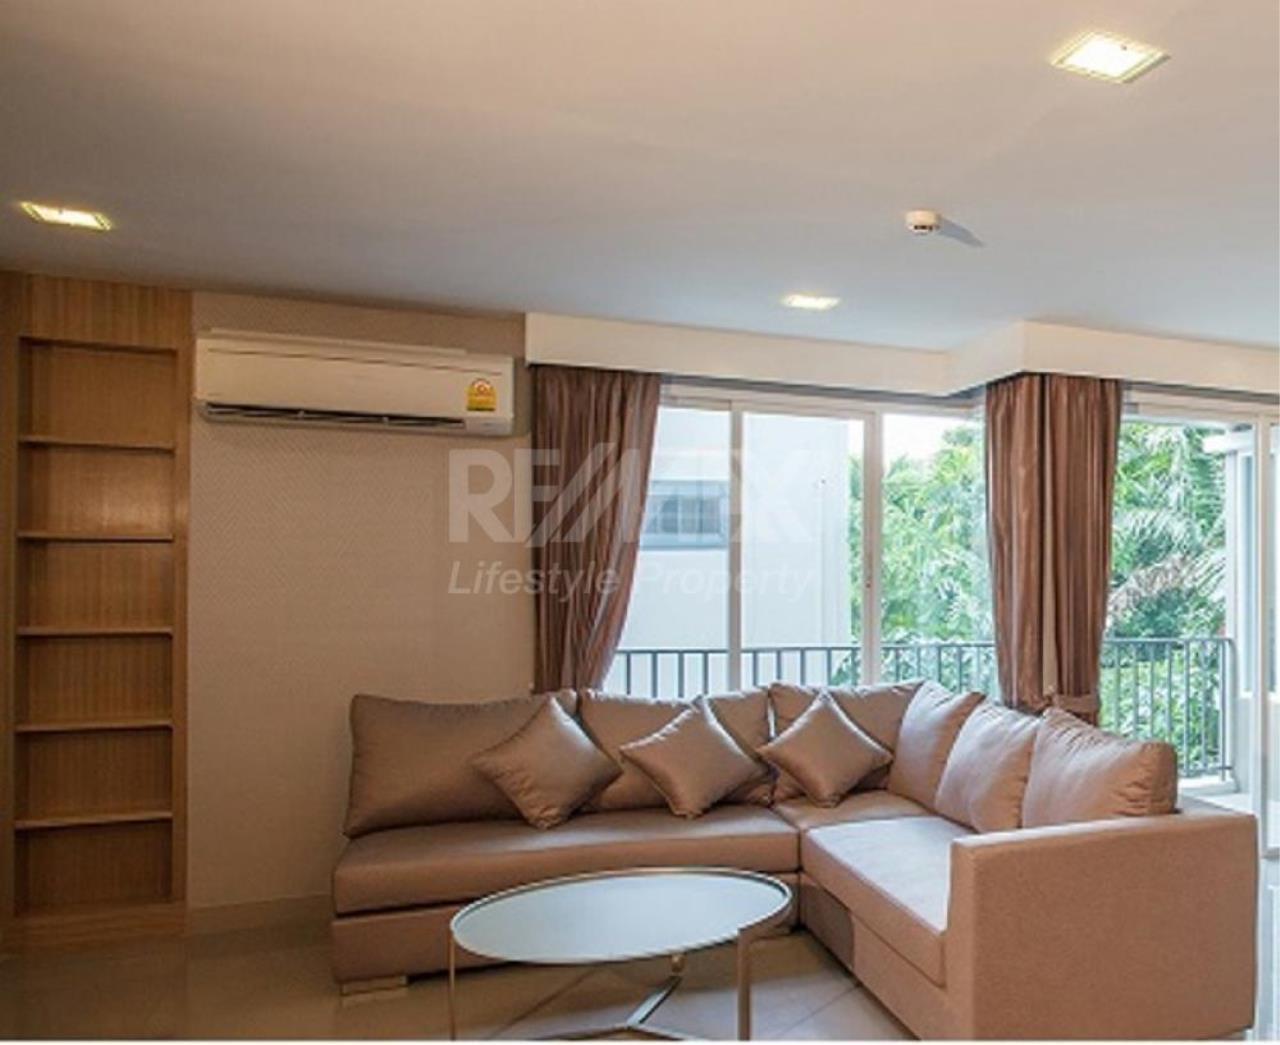 RE/MAX LifeStyle Property Agency's Fernwood Residence 1